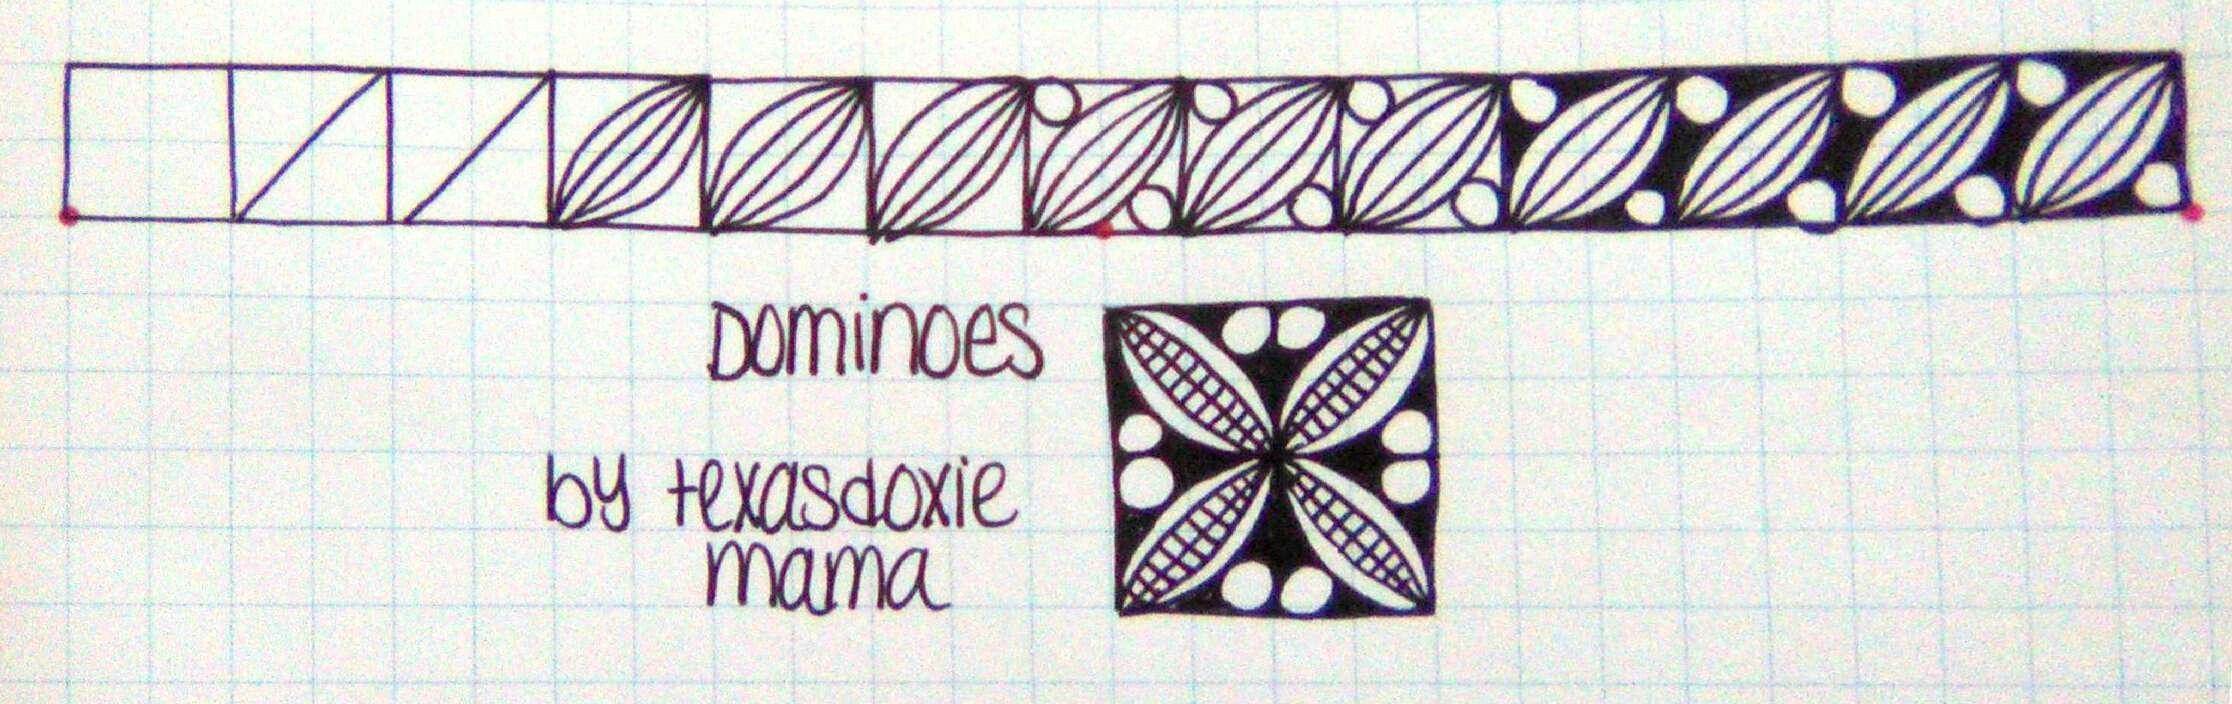 Dominoes tangle